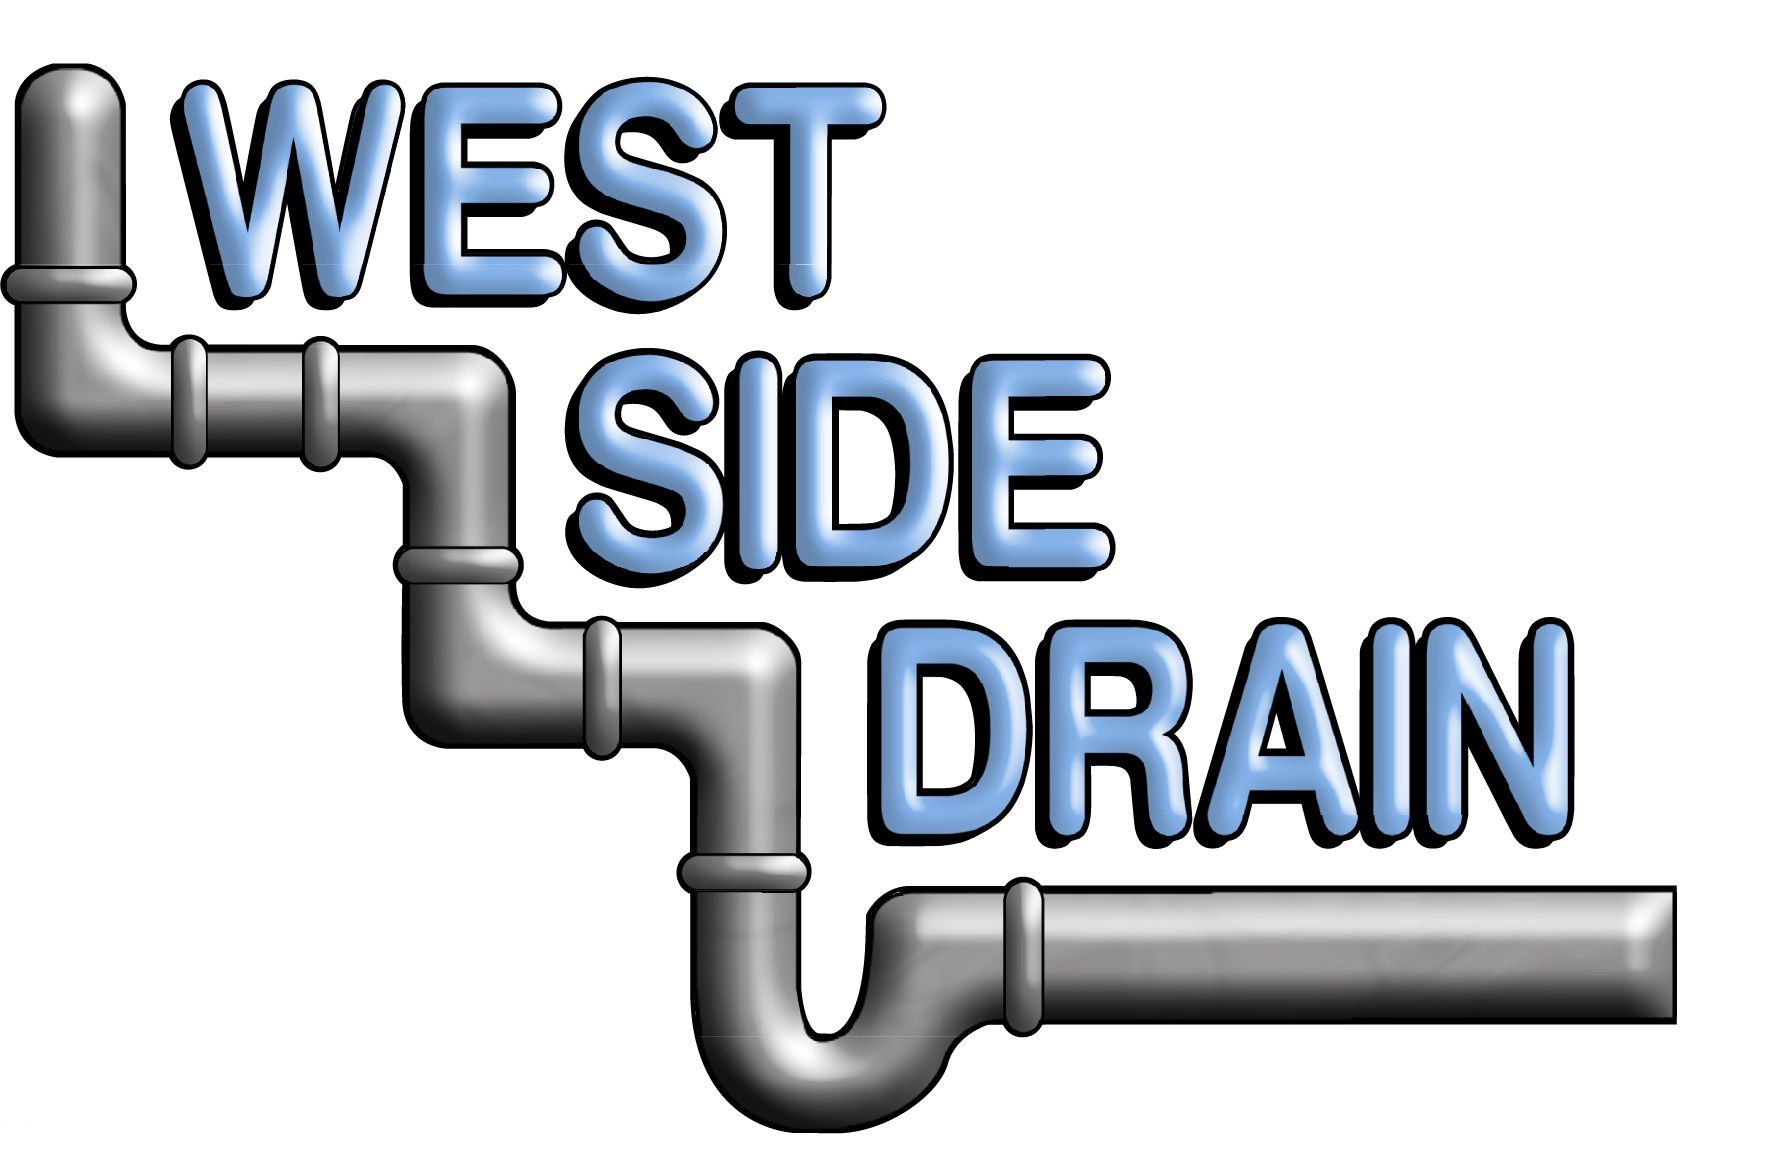 West Side Drain Plumbing Plumbing Drains Plumbing Plumbing Problems